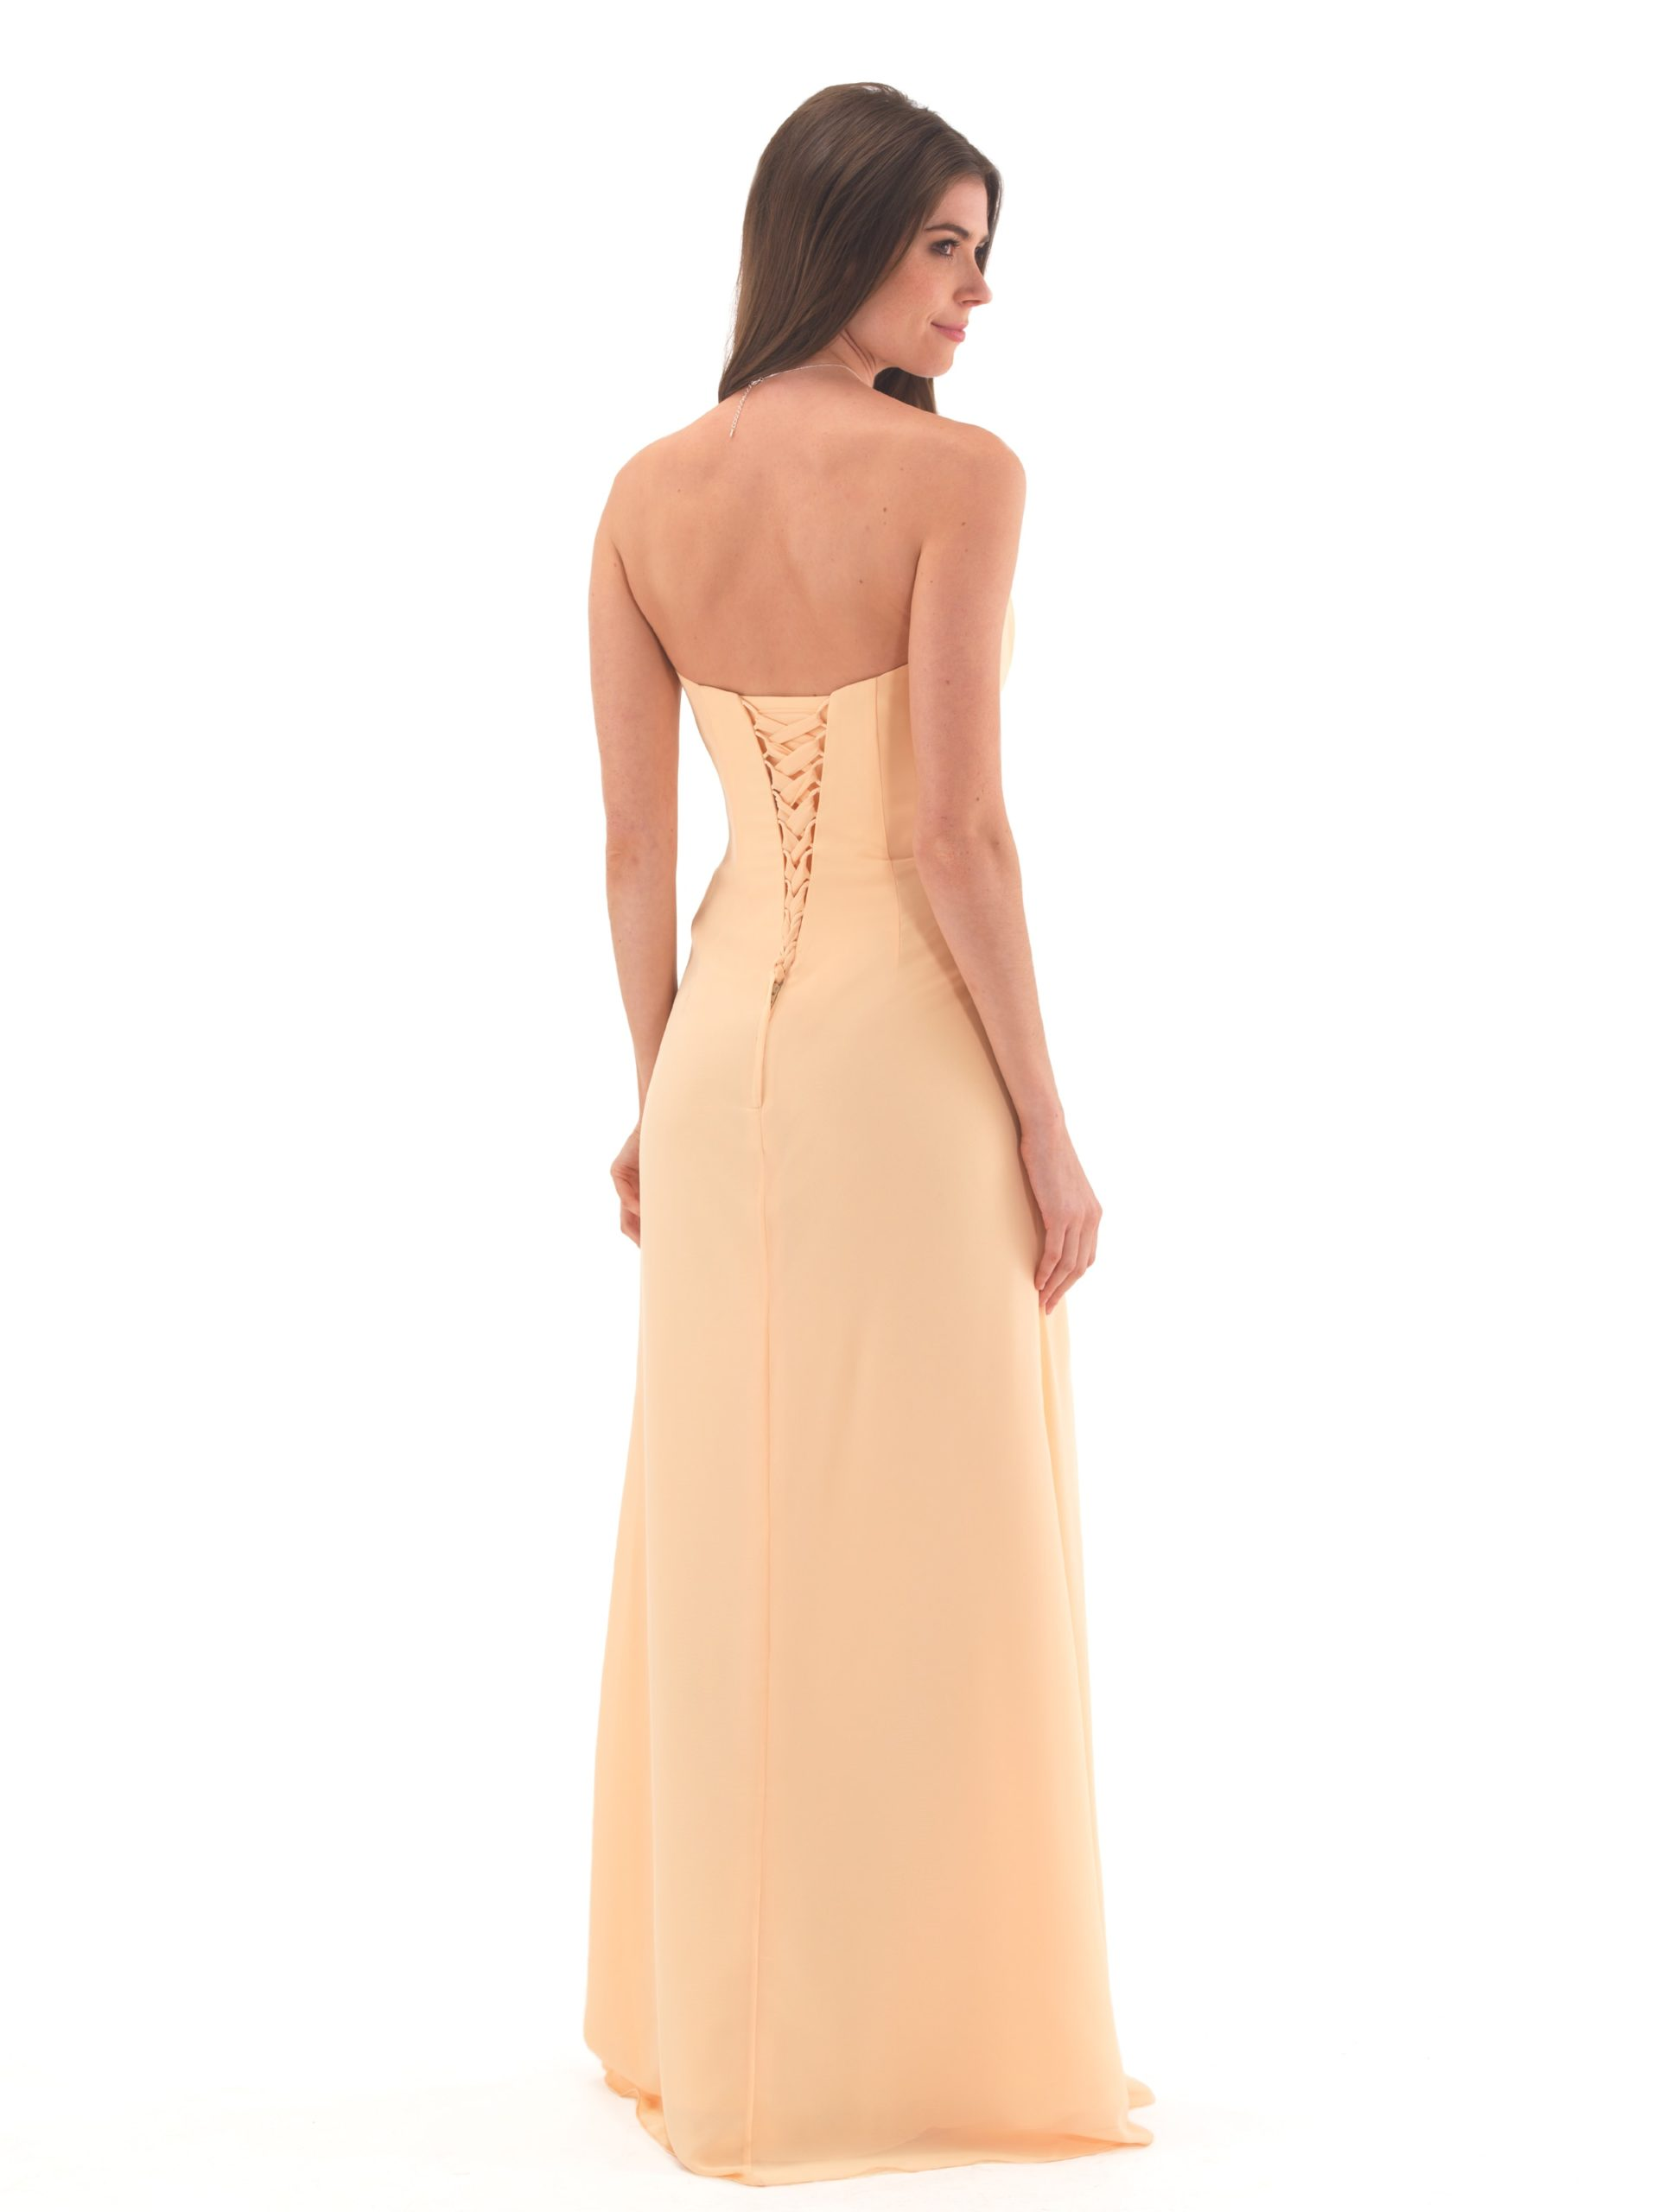 en361-bridesmaid-dress-back